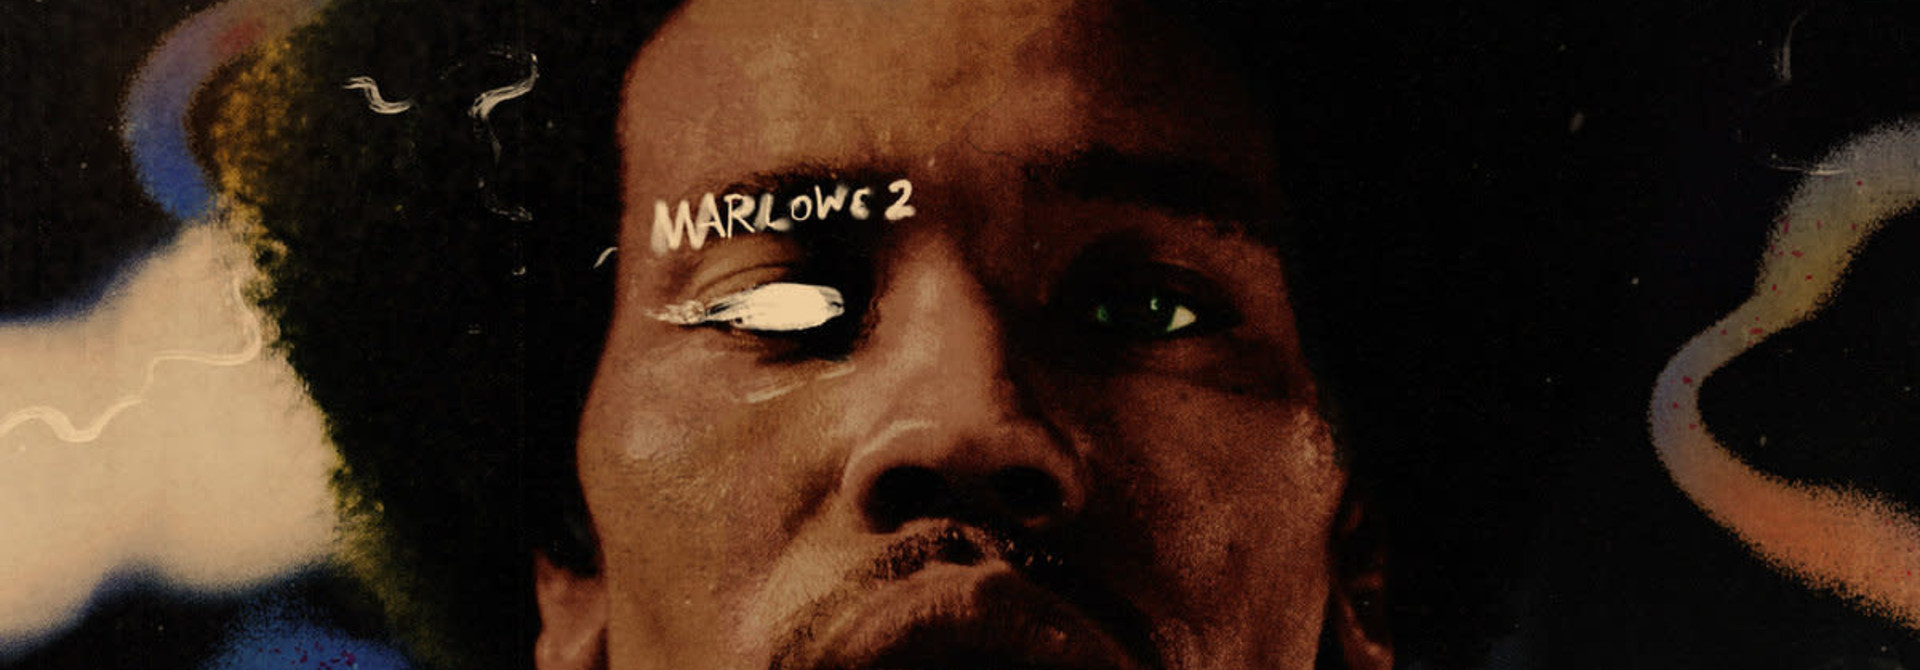 Marlowe • Marlowe 2